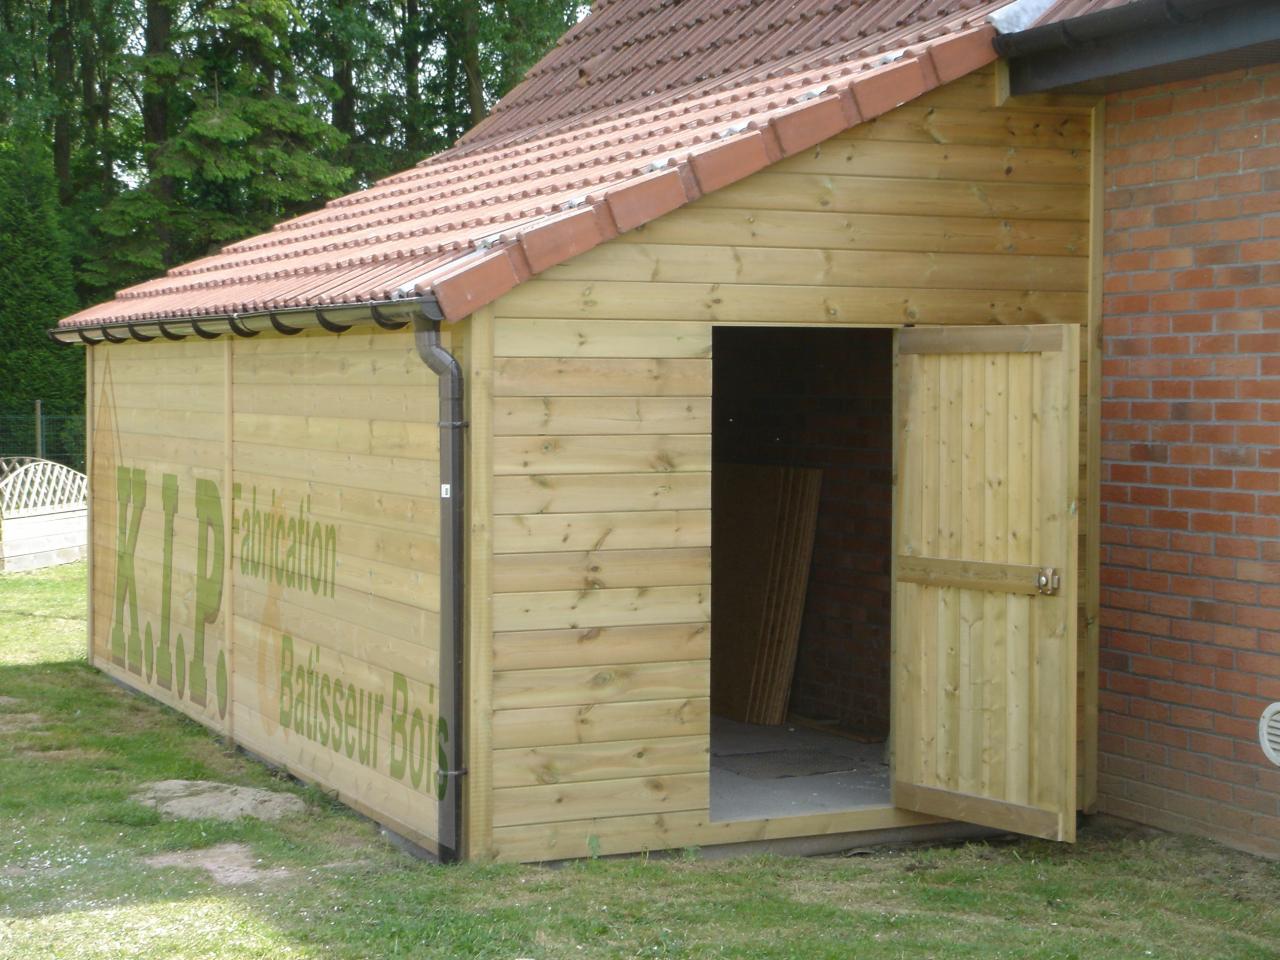 Cabane En Bois Garage - Mailleraye.fr Jardin serapportantà Abri De Jardin Métal Pas Cher